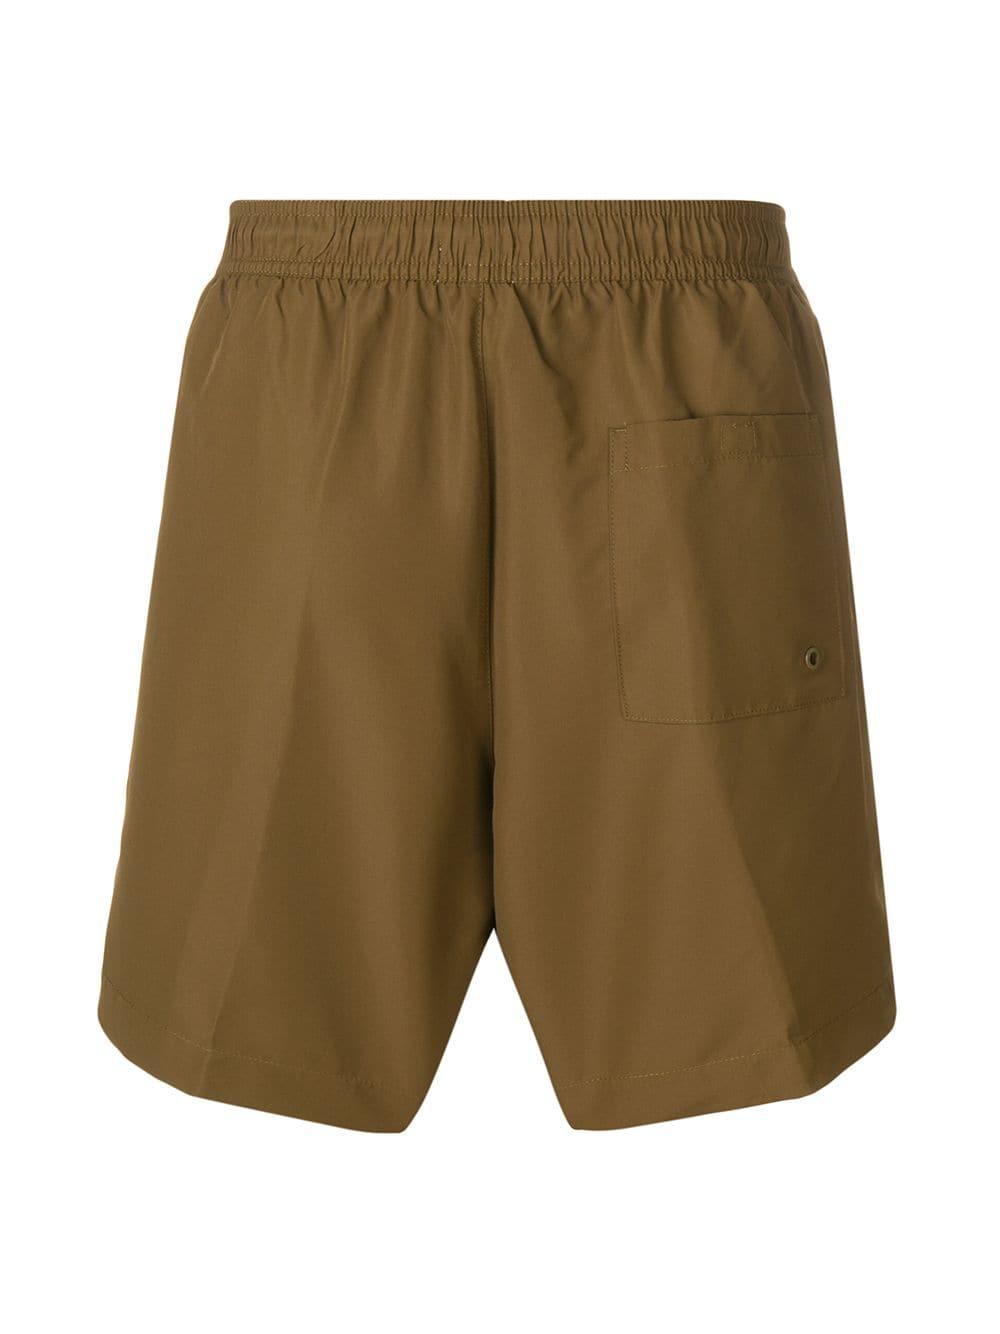 57b473ff76bde Calvin Klein Logo Swim Shorts in Green for Men - Lyst